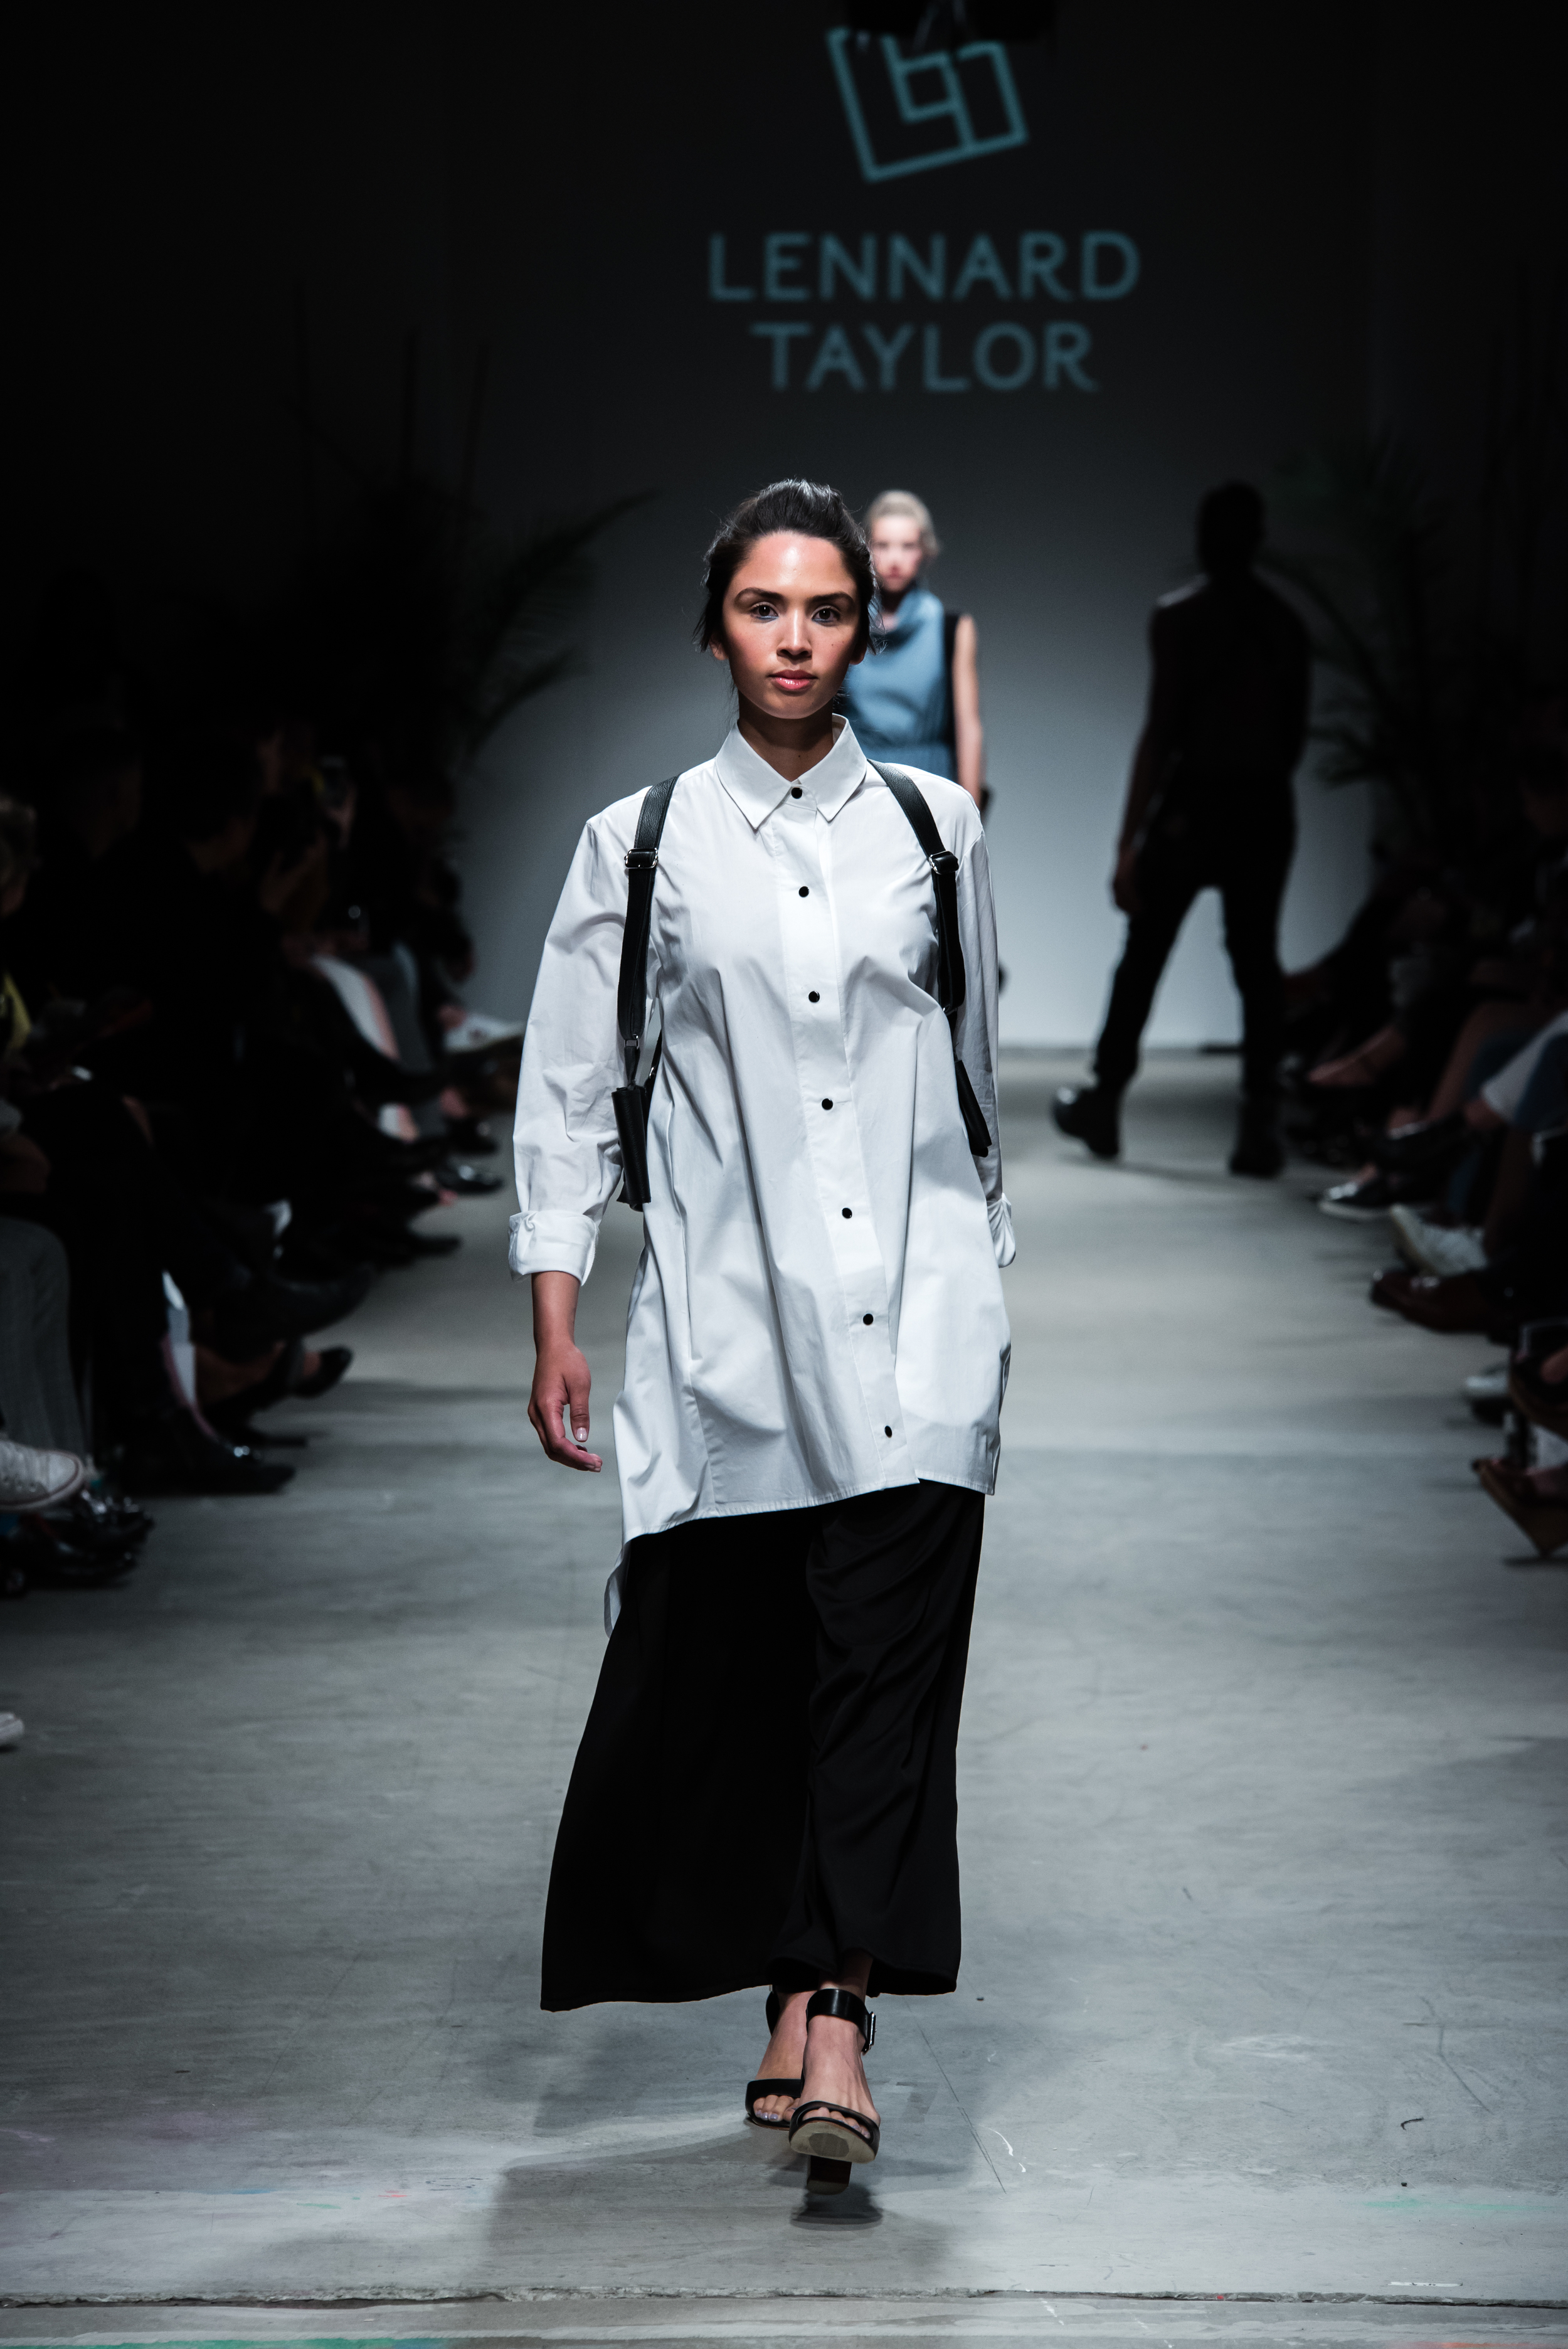 Lennard Taylor-Sher Khan Niazi-7598.jpg